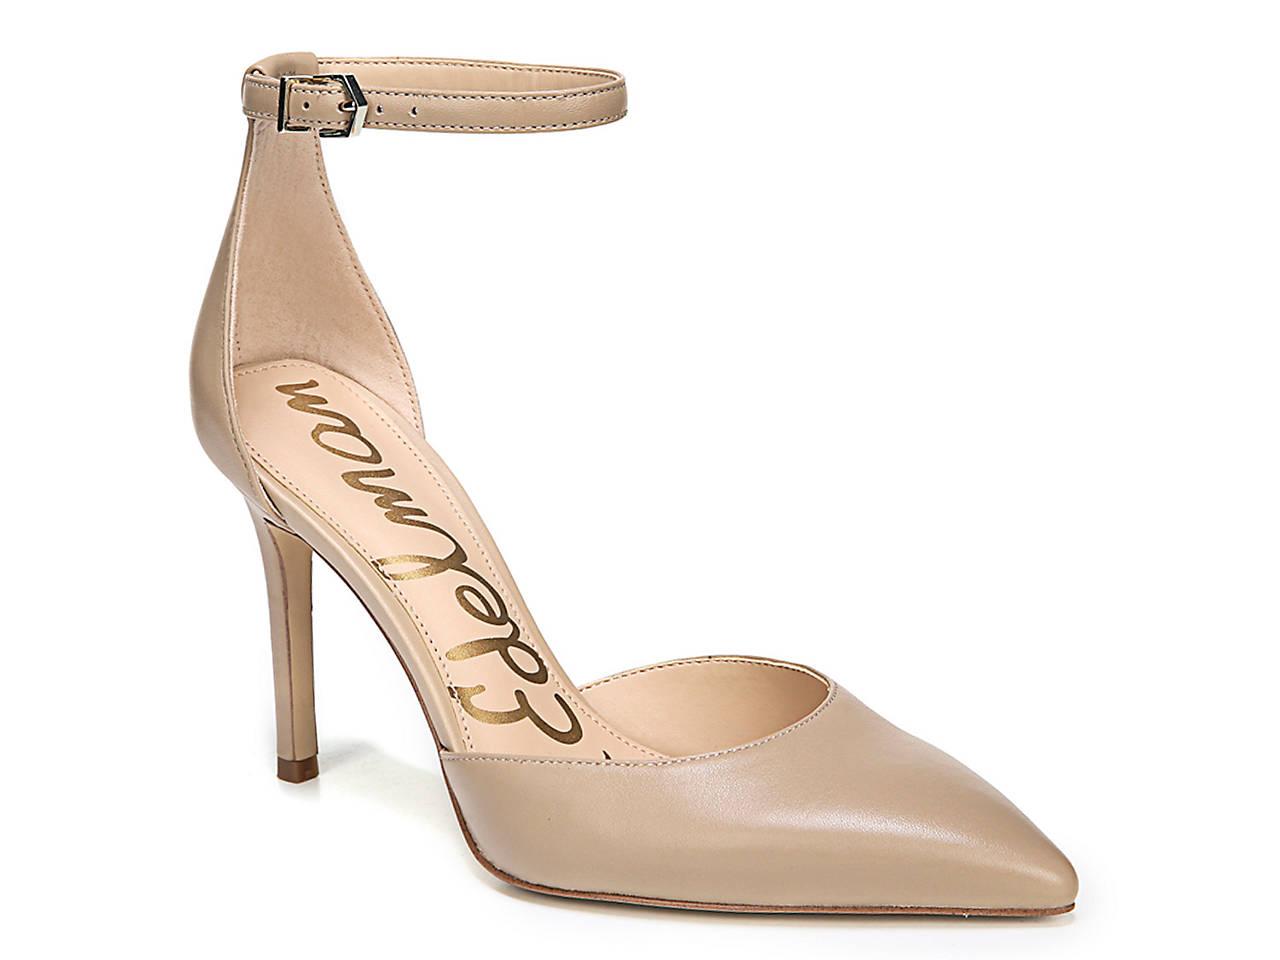 917af996fe1b3b Sam Edelman Harlow Pump Women s Shoes